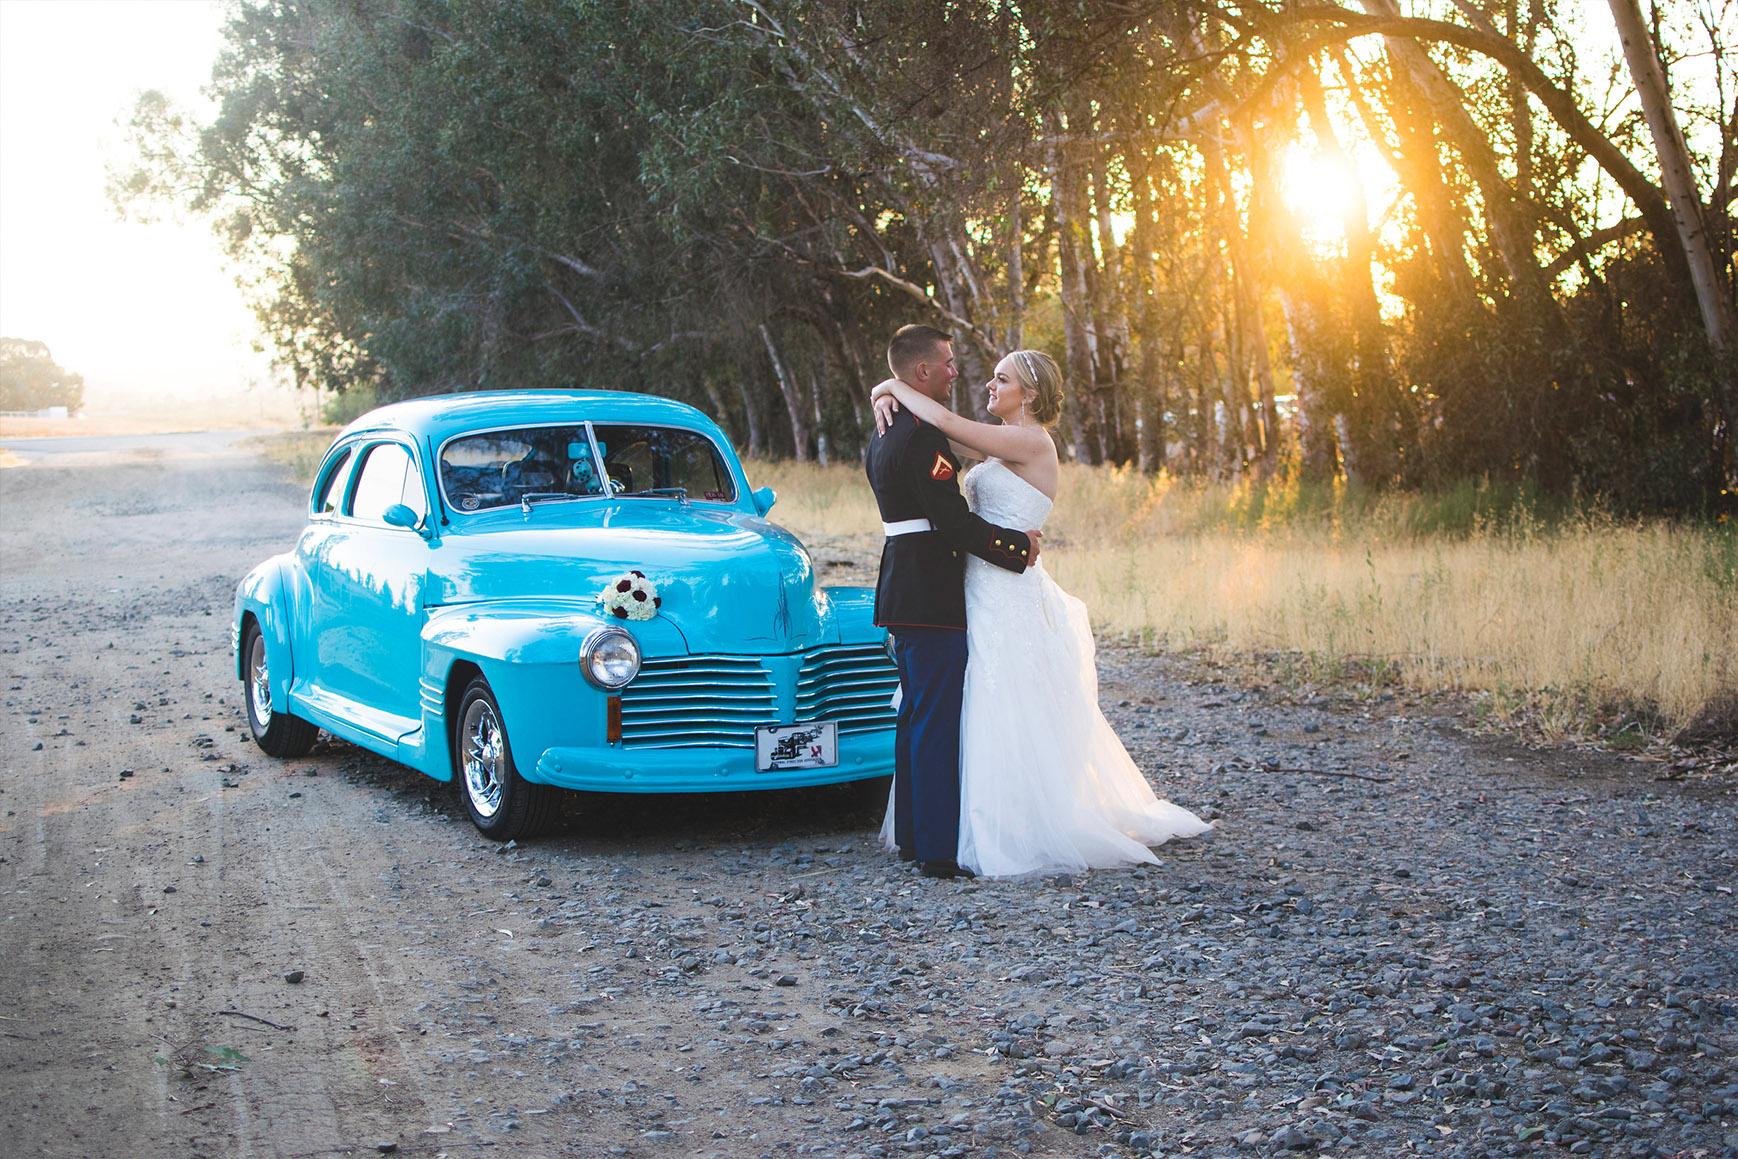 Classic blue car - Orchard - Menifee, California - Riverside County - Wedgewood Weddings